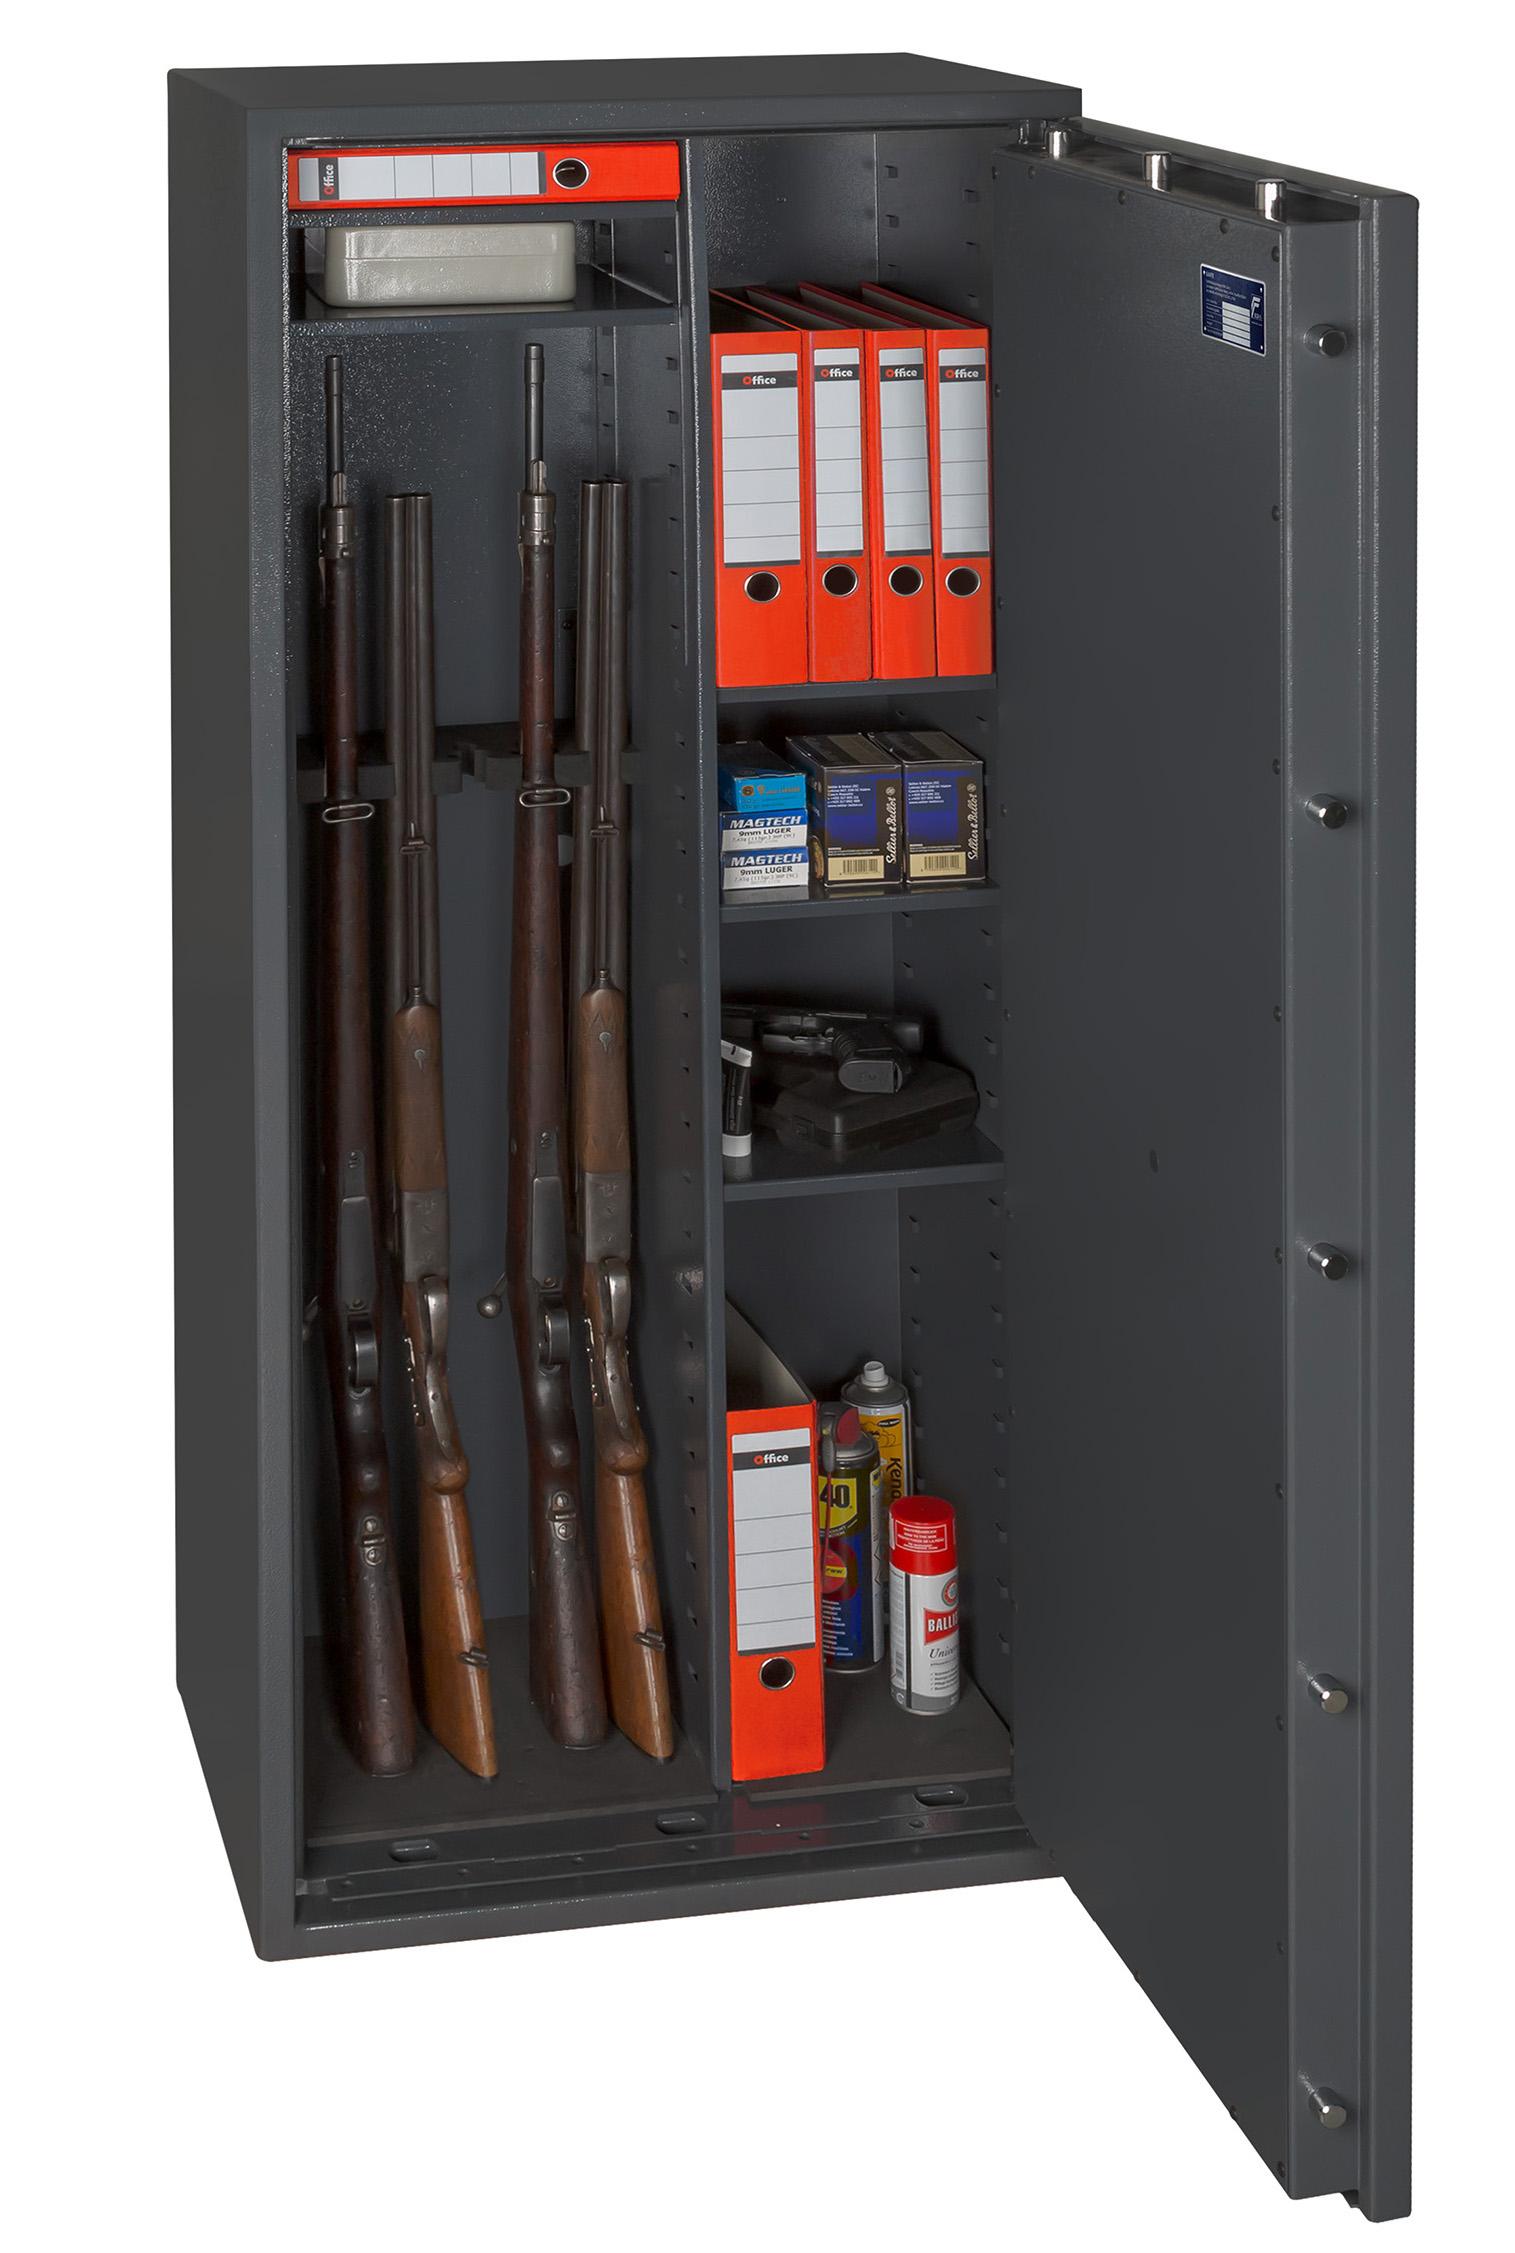 waffenschrank gun safe kombi nach en 1143 1 mit zahlenschloss. Black Bedroom Furniture Sets. Home Design Ideas